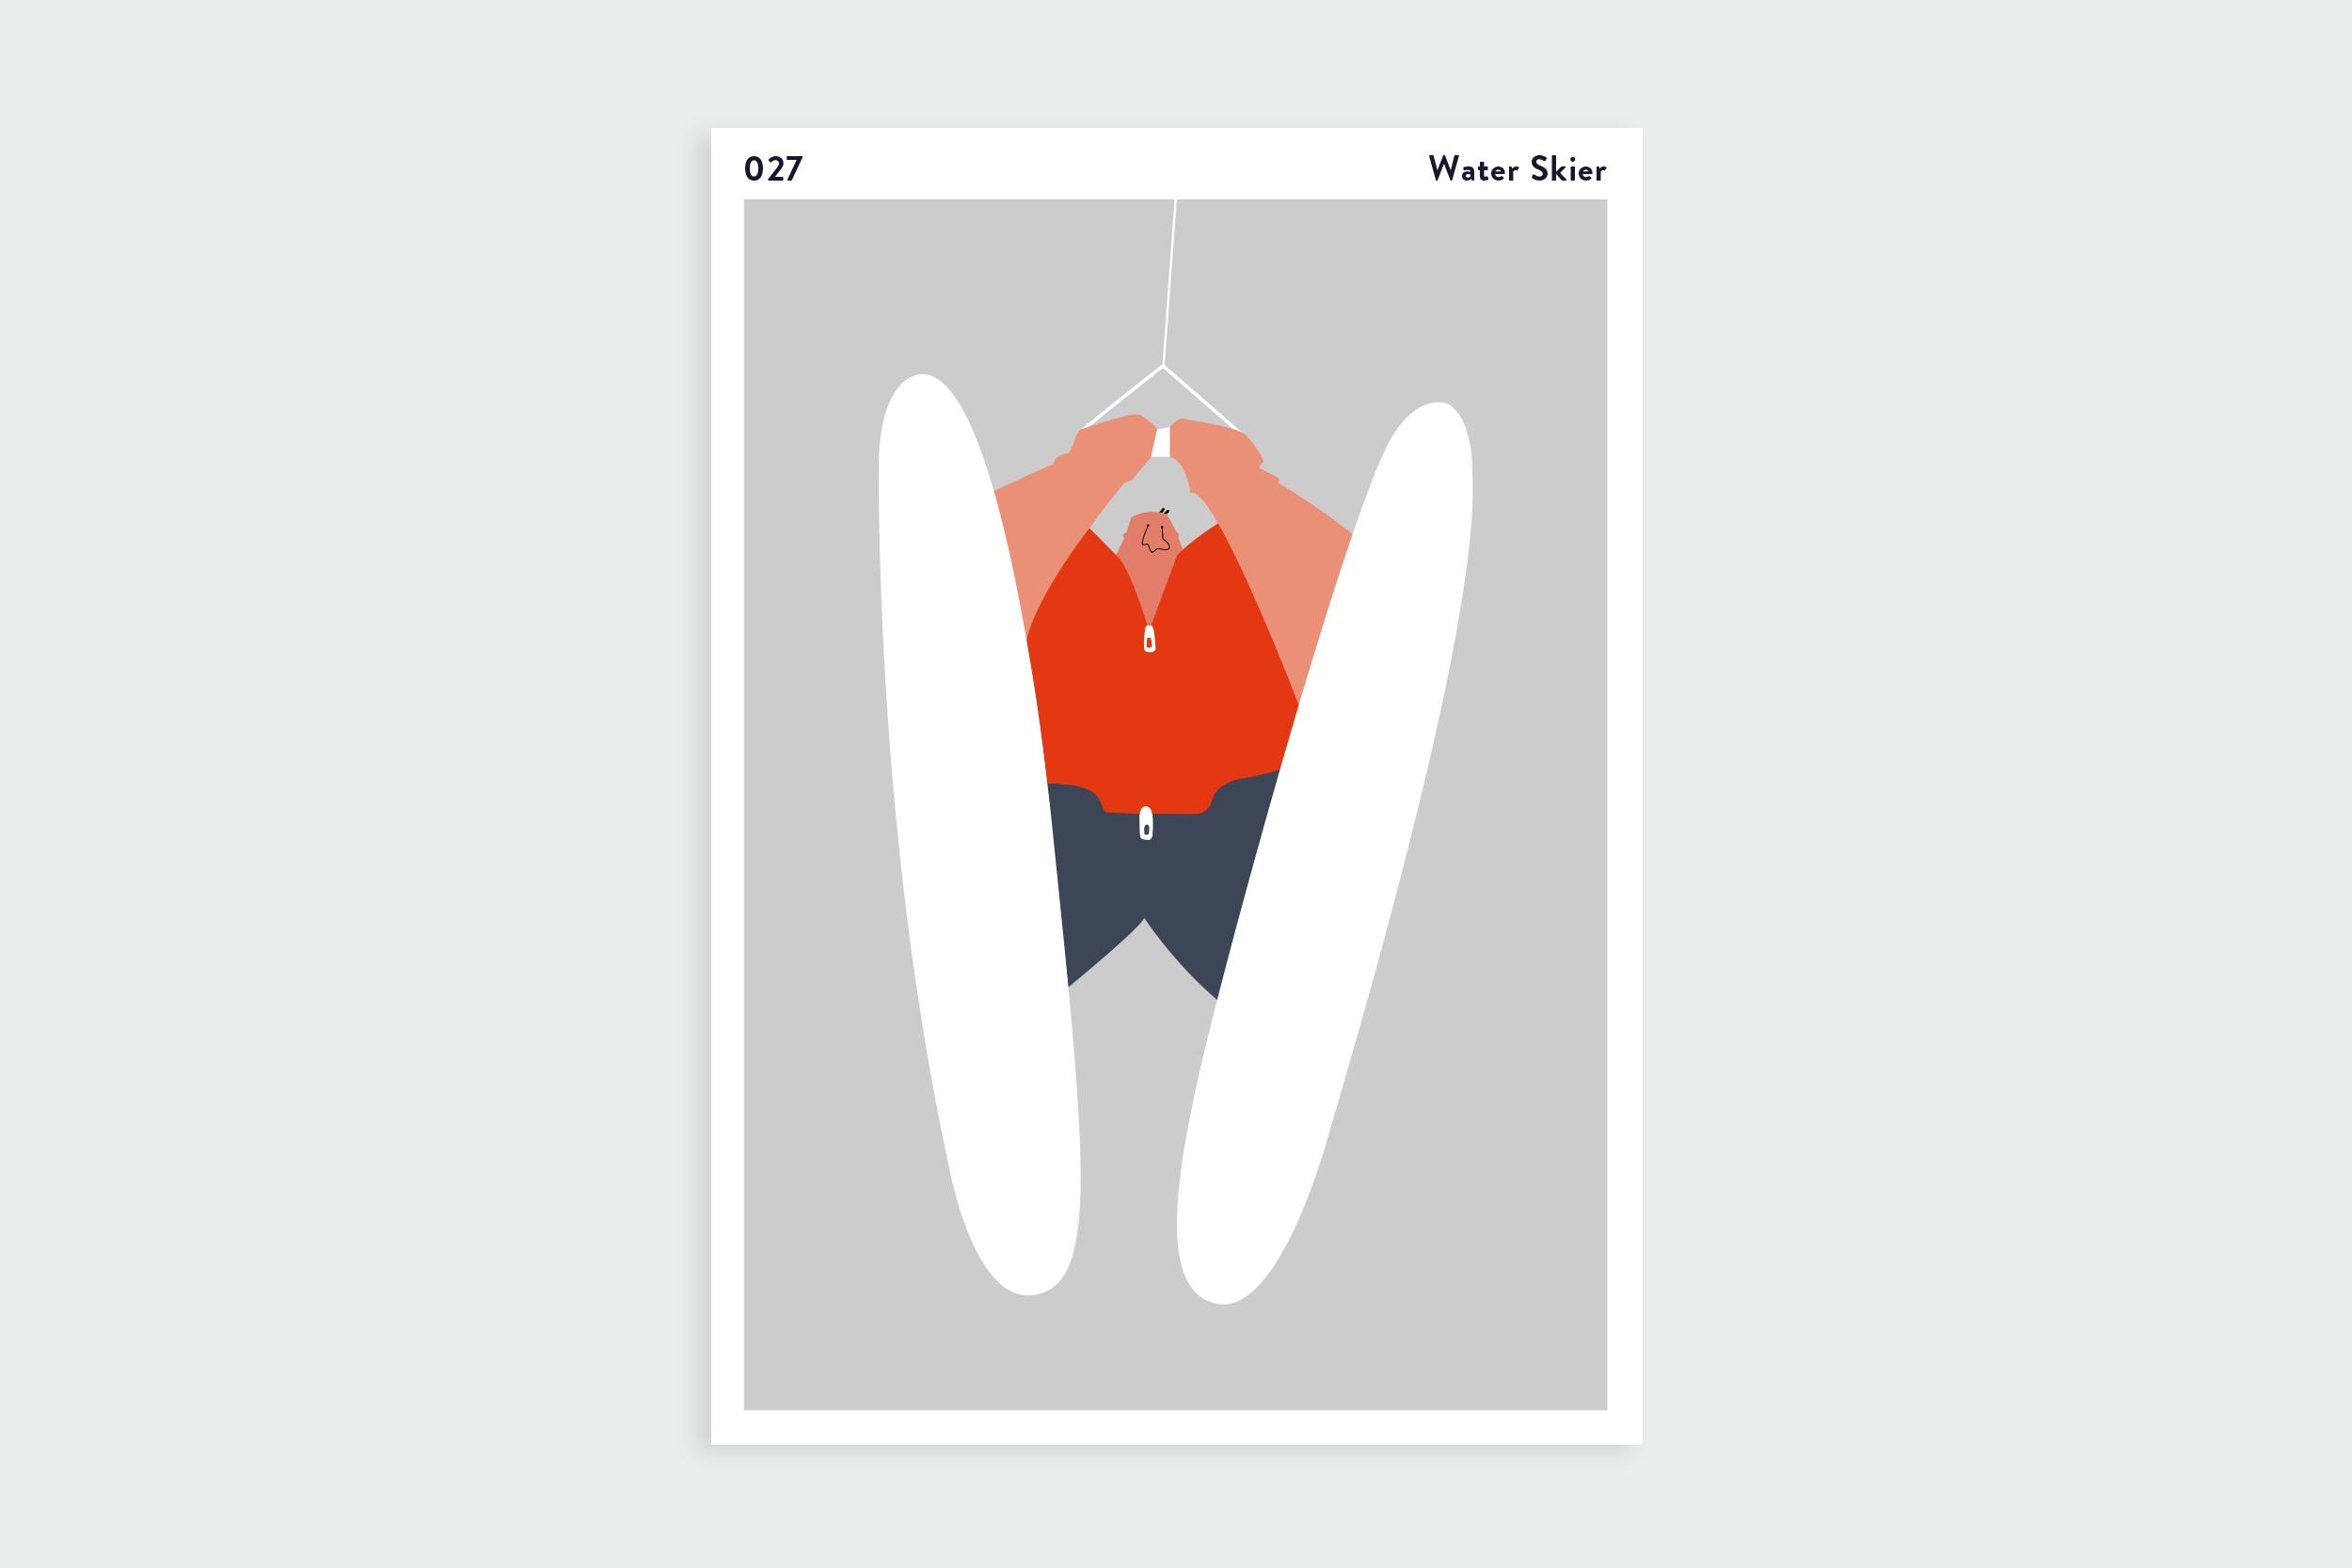 water-skier.png